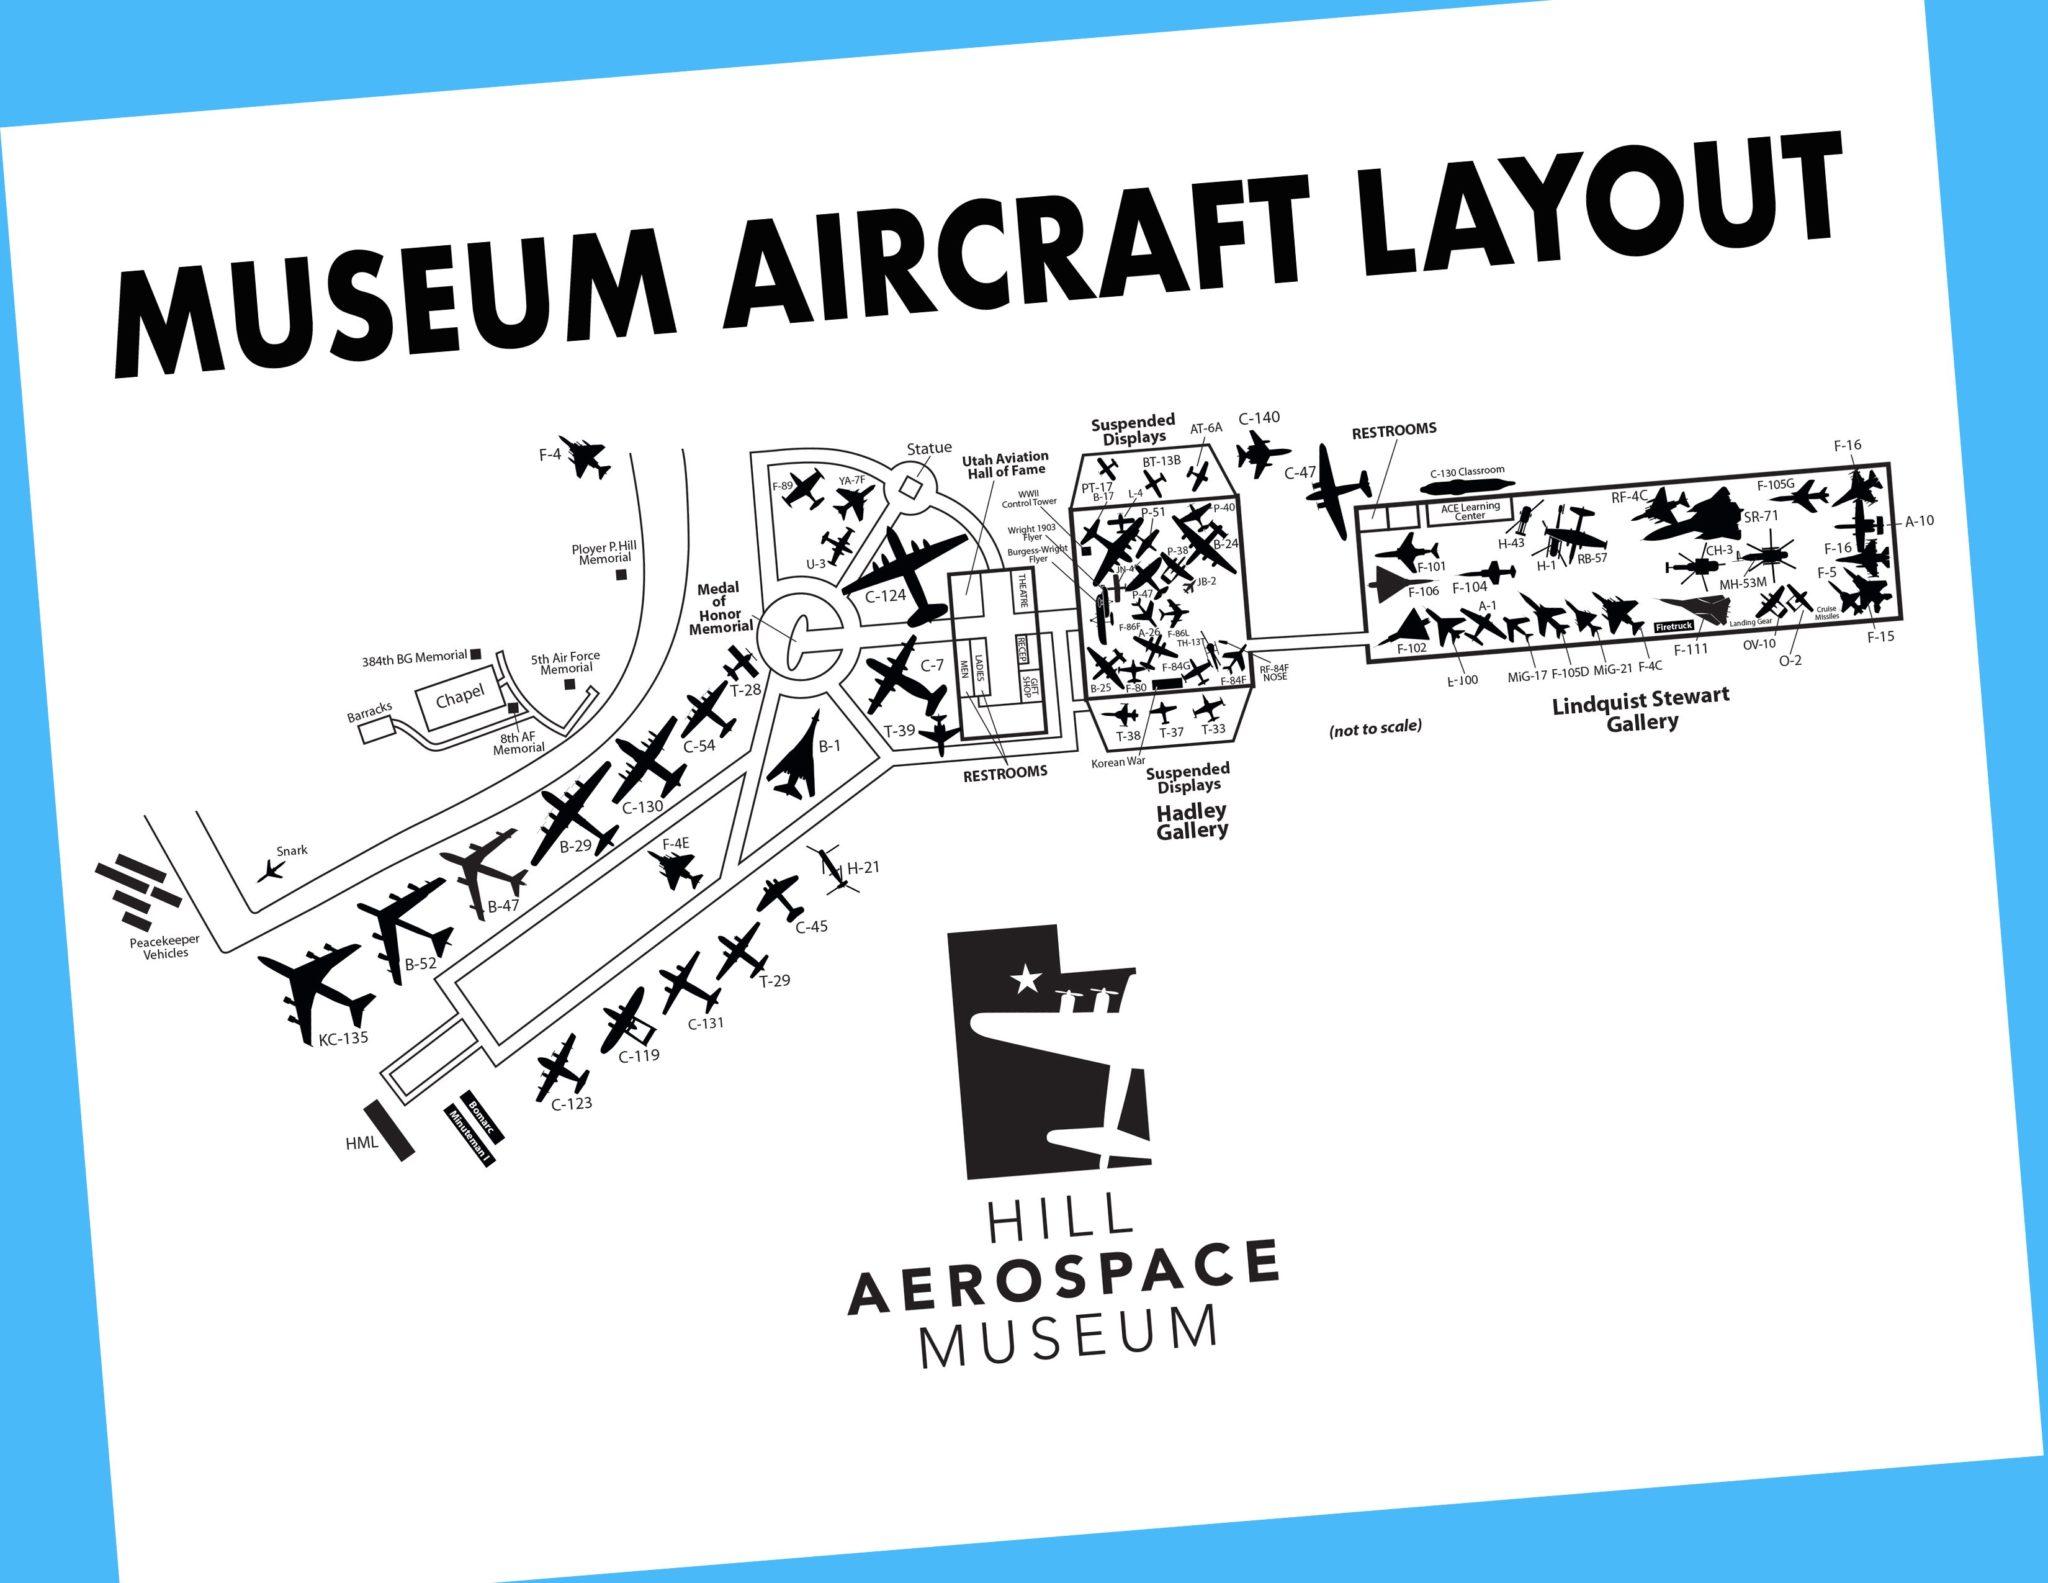 Aircraft Layout at Hill Aerospace Museum